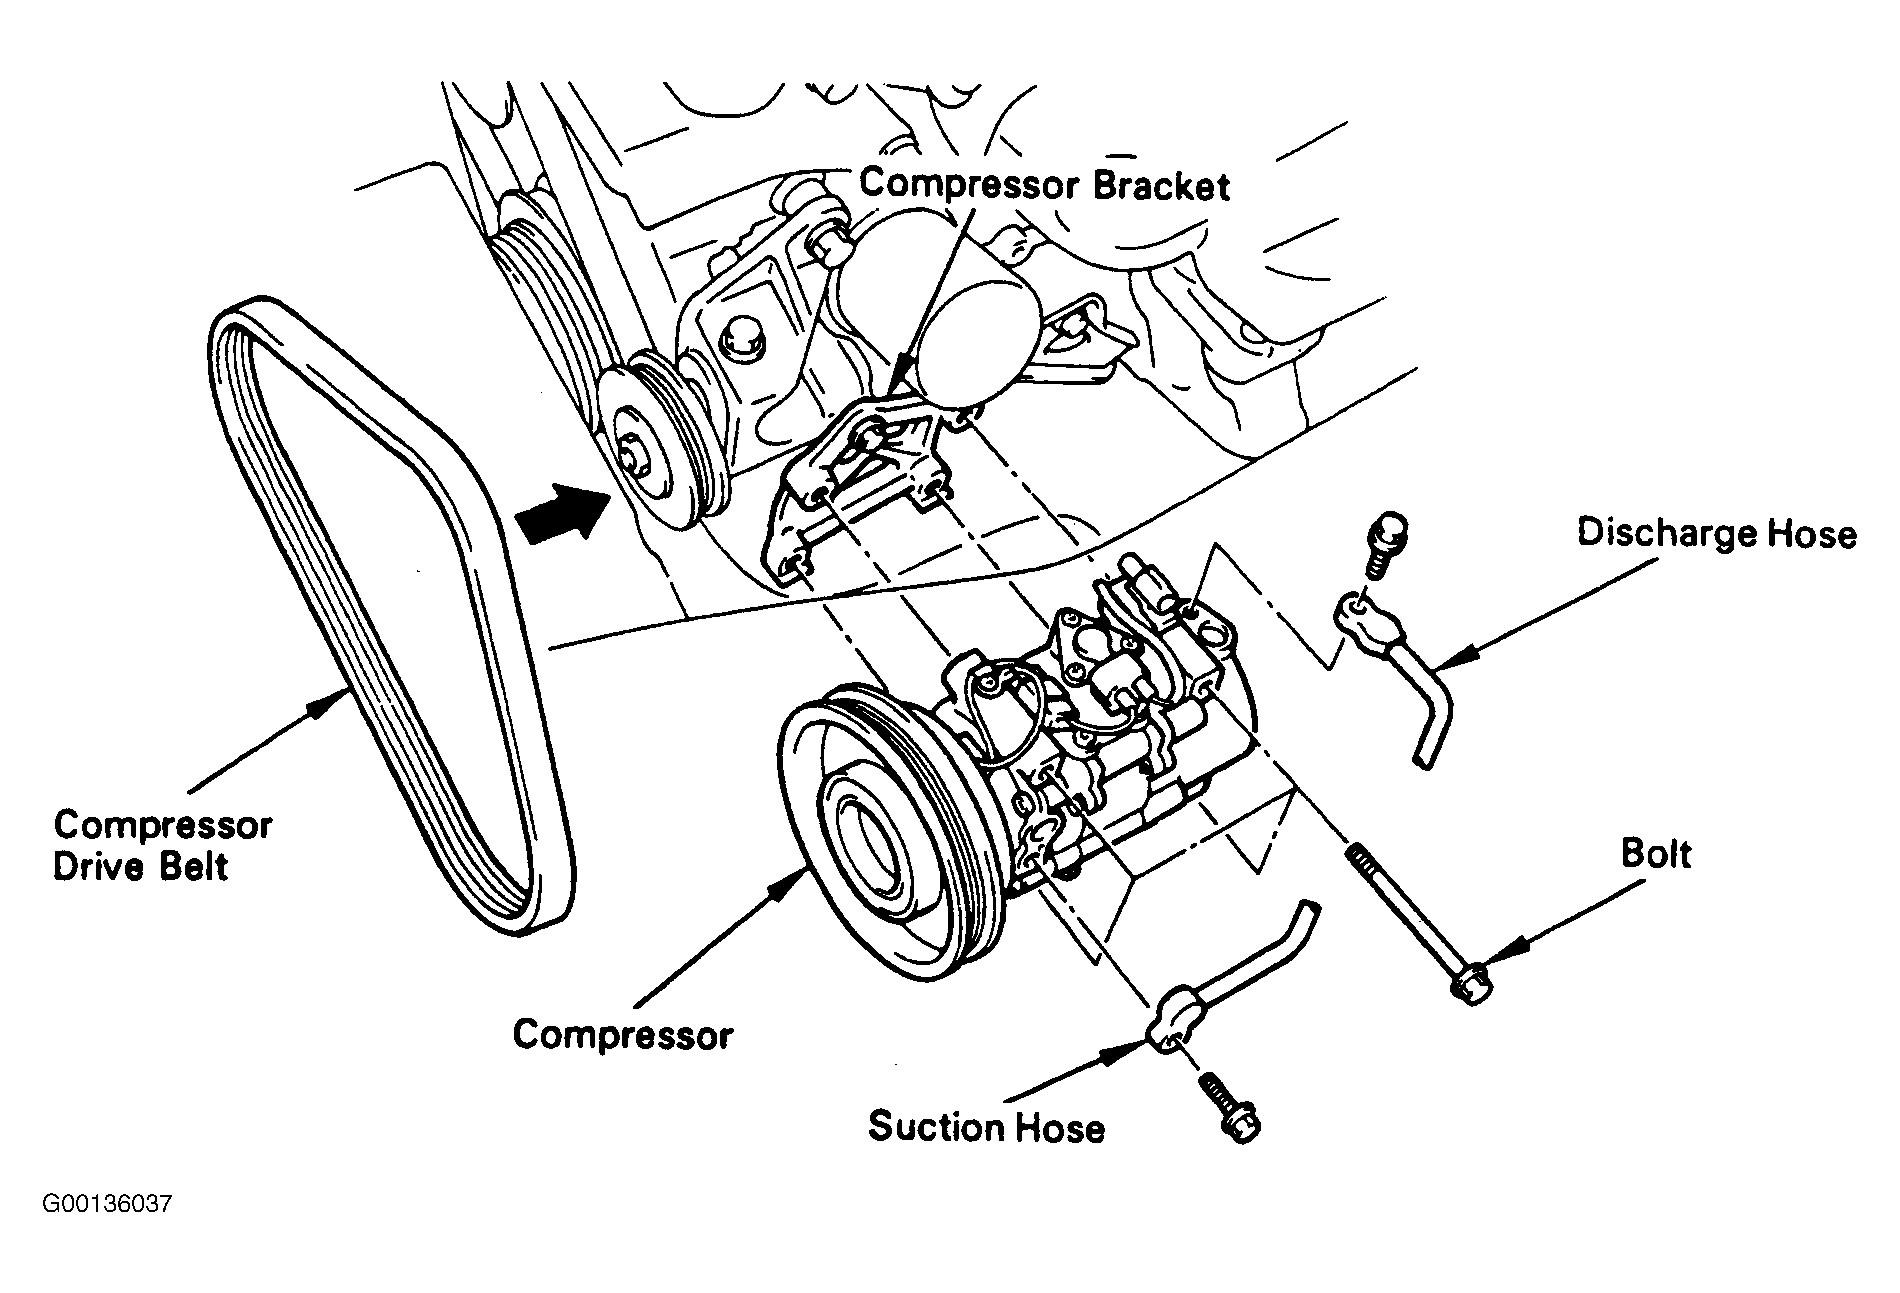 2009 Toyota Camry V6 Serpentine Belt Diagram